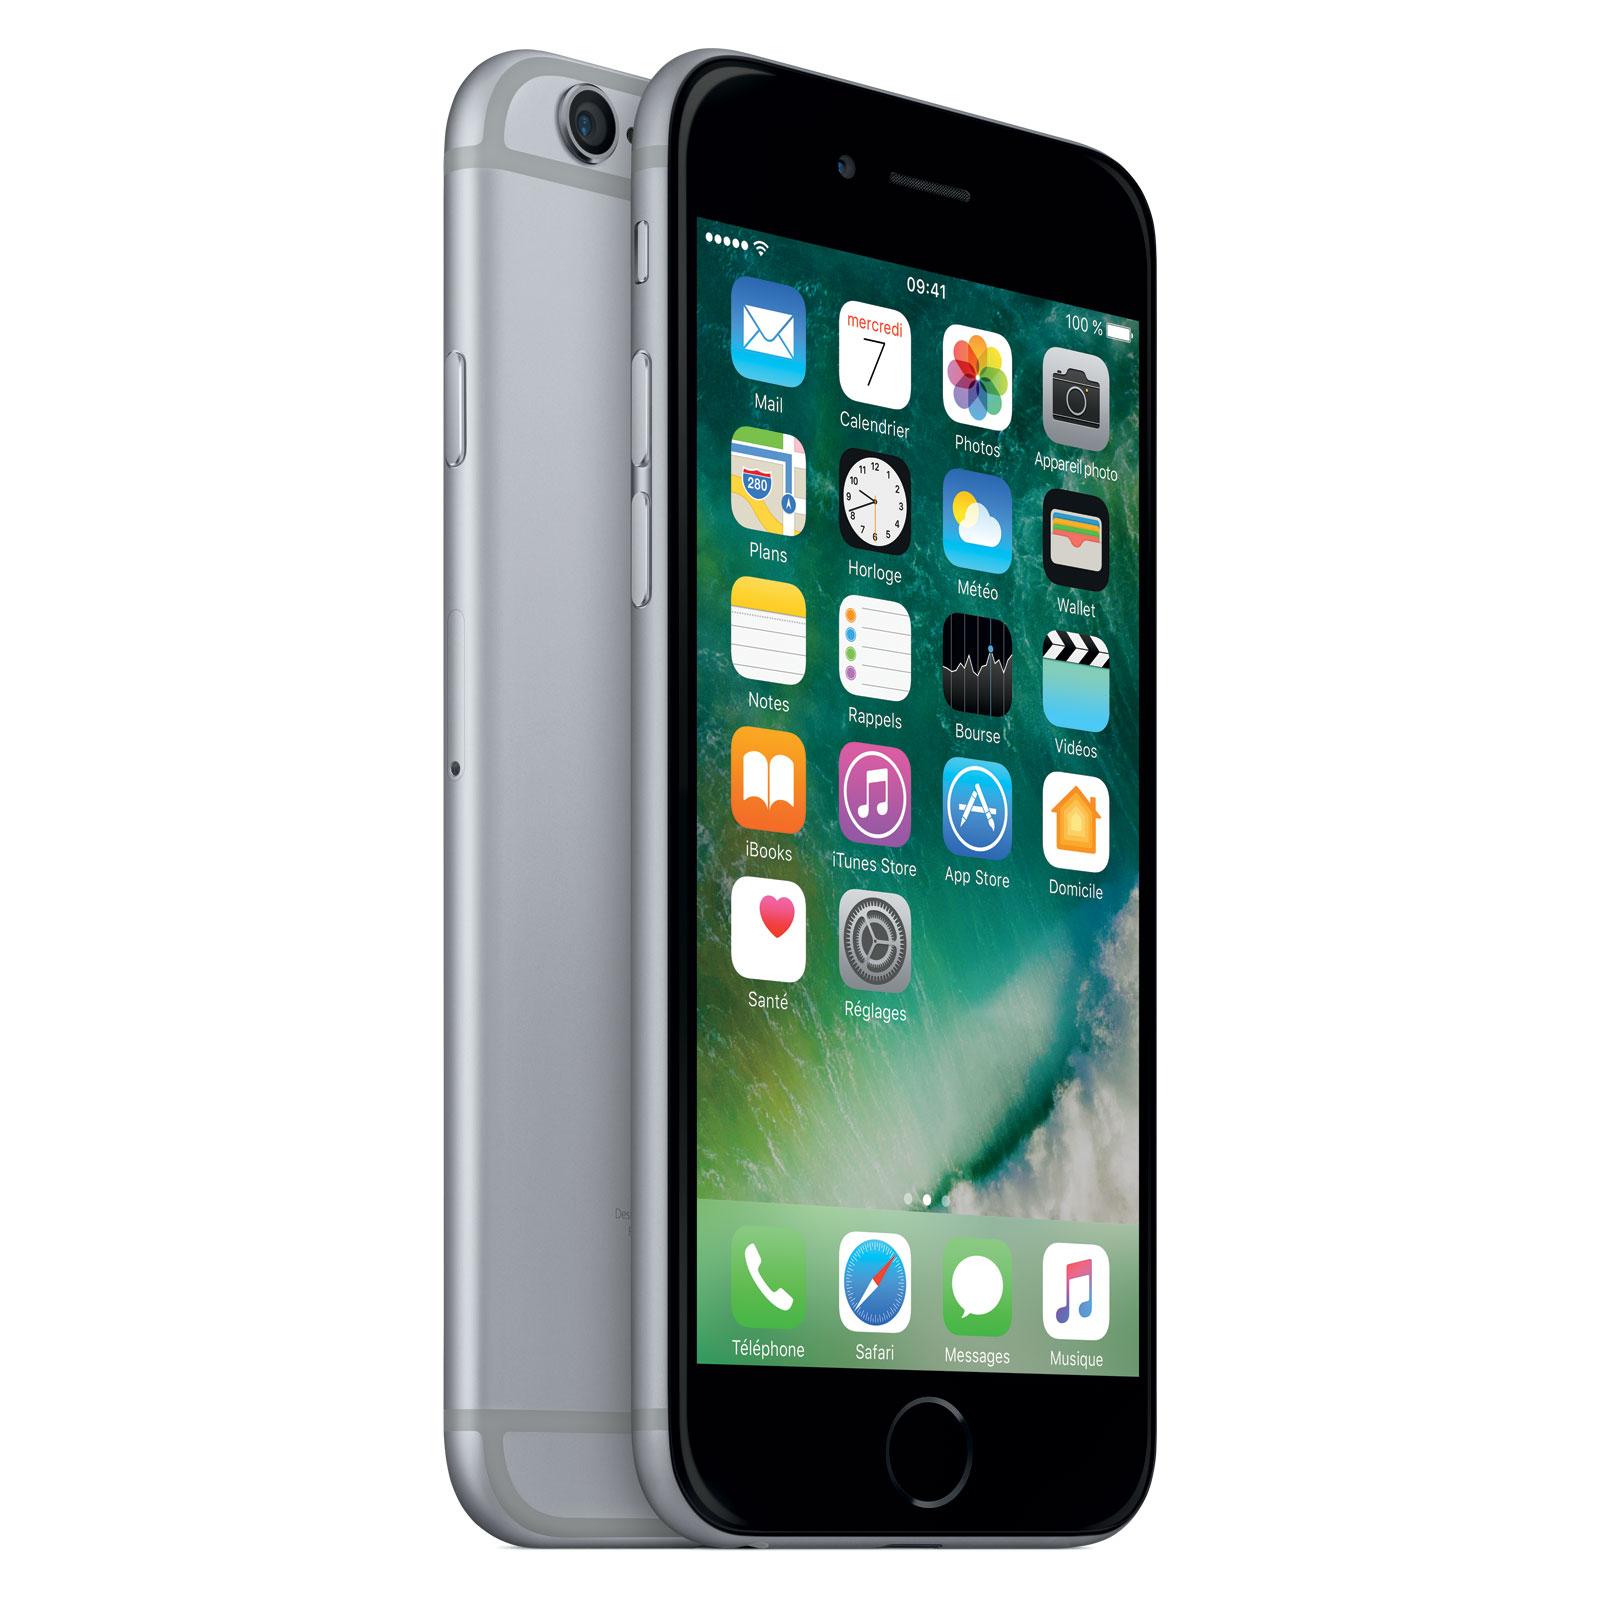 "Smartphone 4.7"" iPhone 6S - 16 Go, Or ou Gris sidéral - Reconditionné (via ODR 50€)"